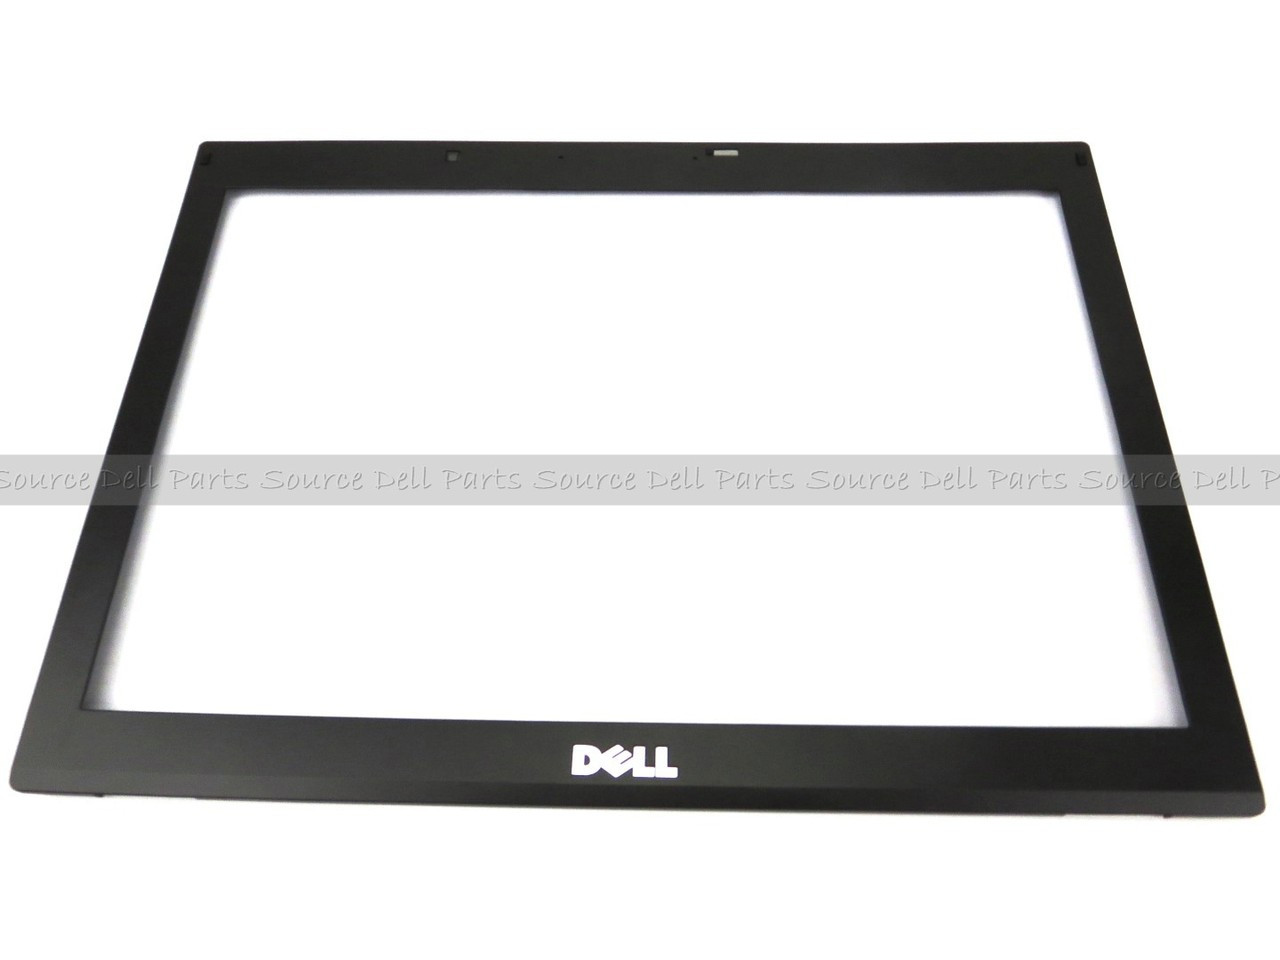 Dell Latitude E6410 ATG LCD Front Trim Bezel No Camera Window *For ATG Display - NX0H1